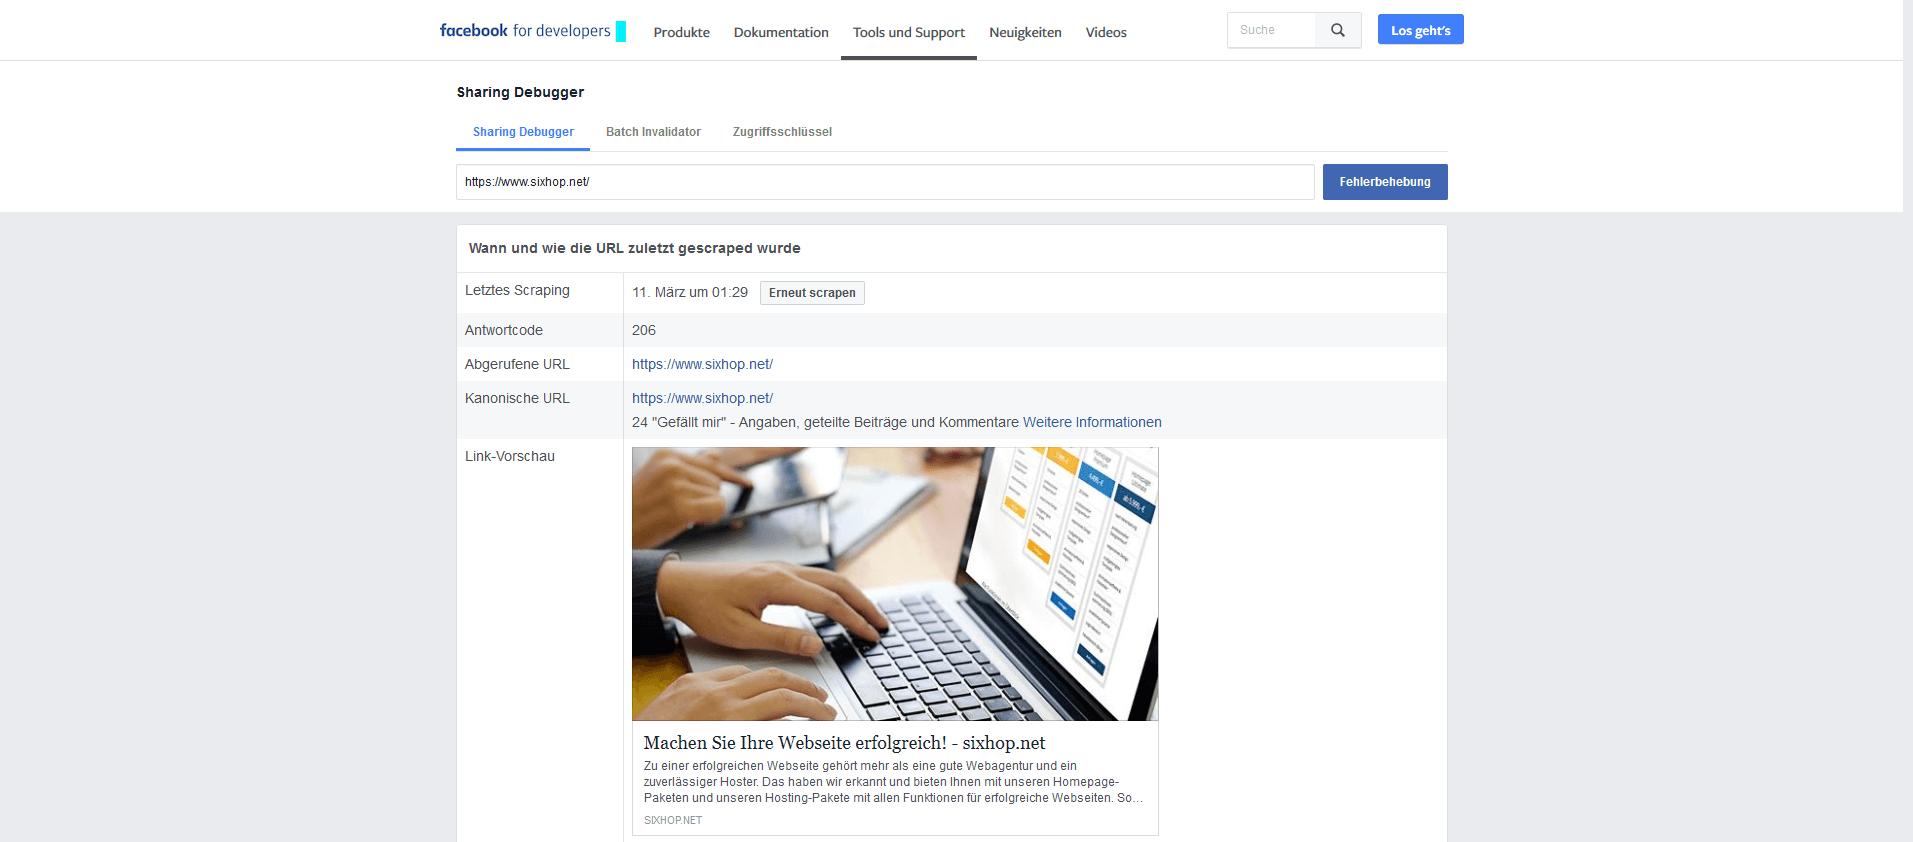 Facebook Developer Link Vorschau